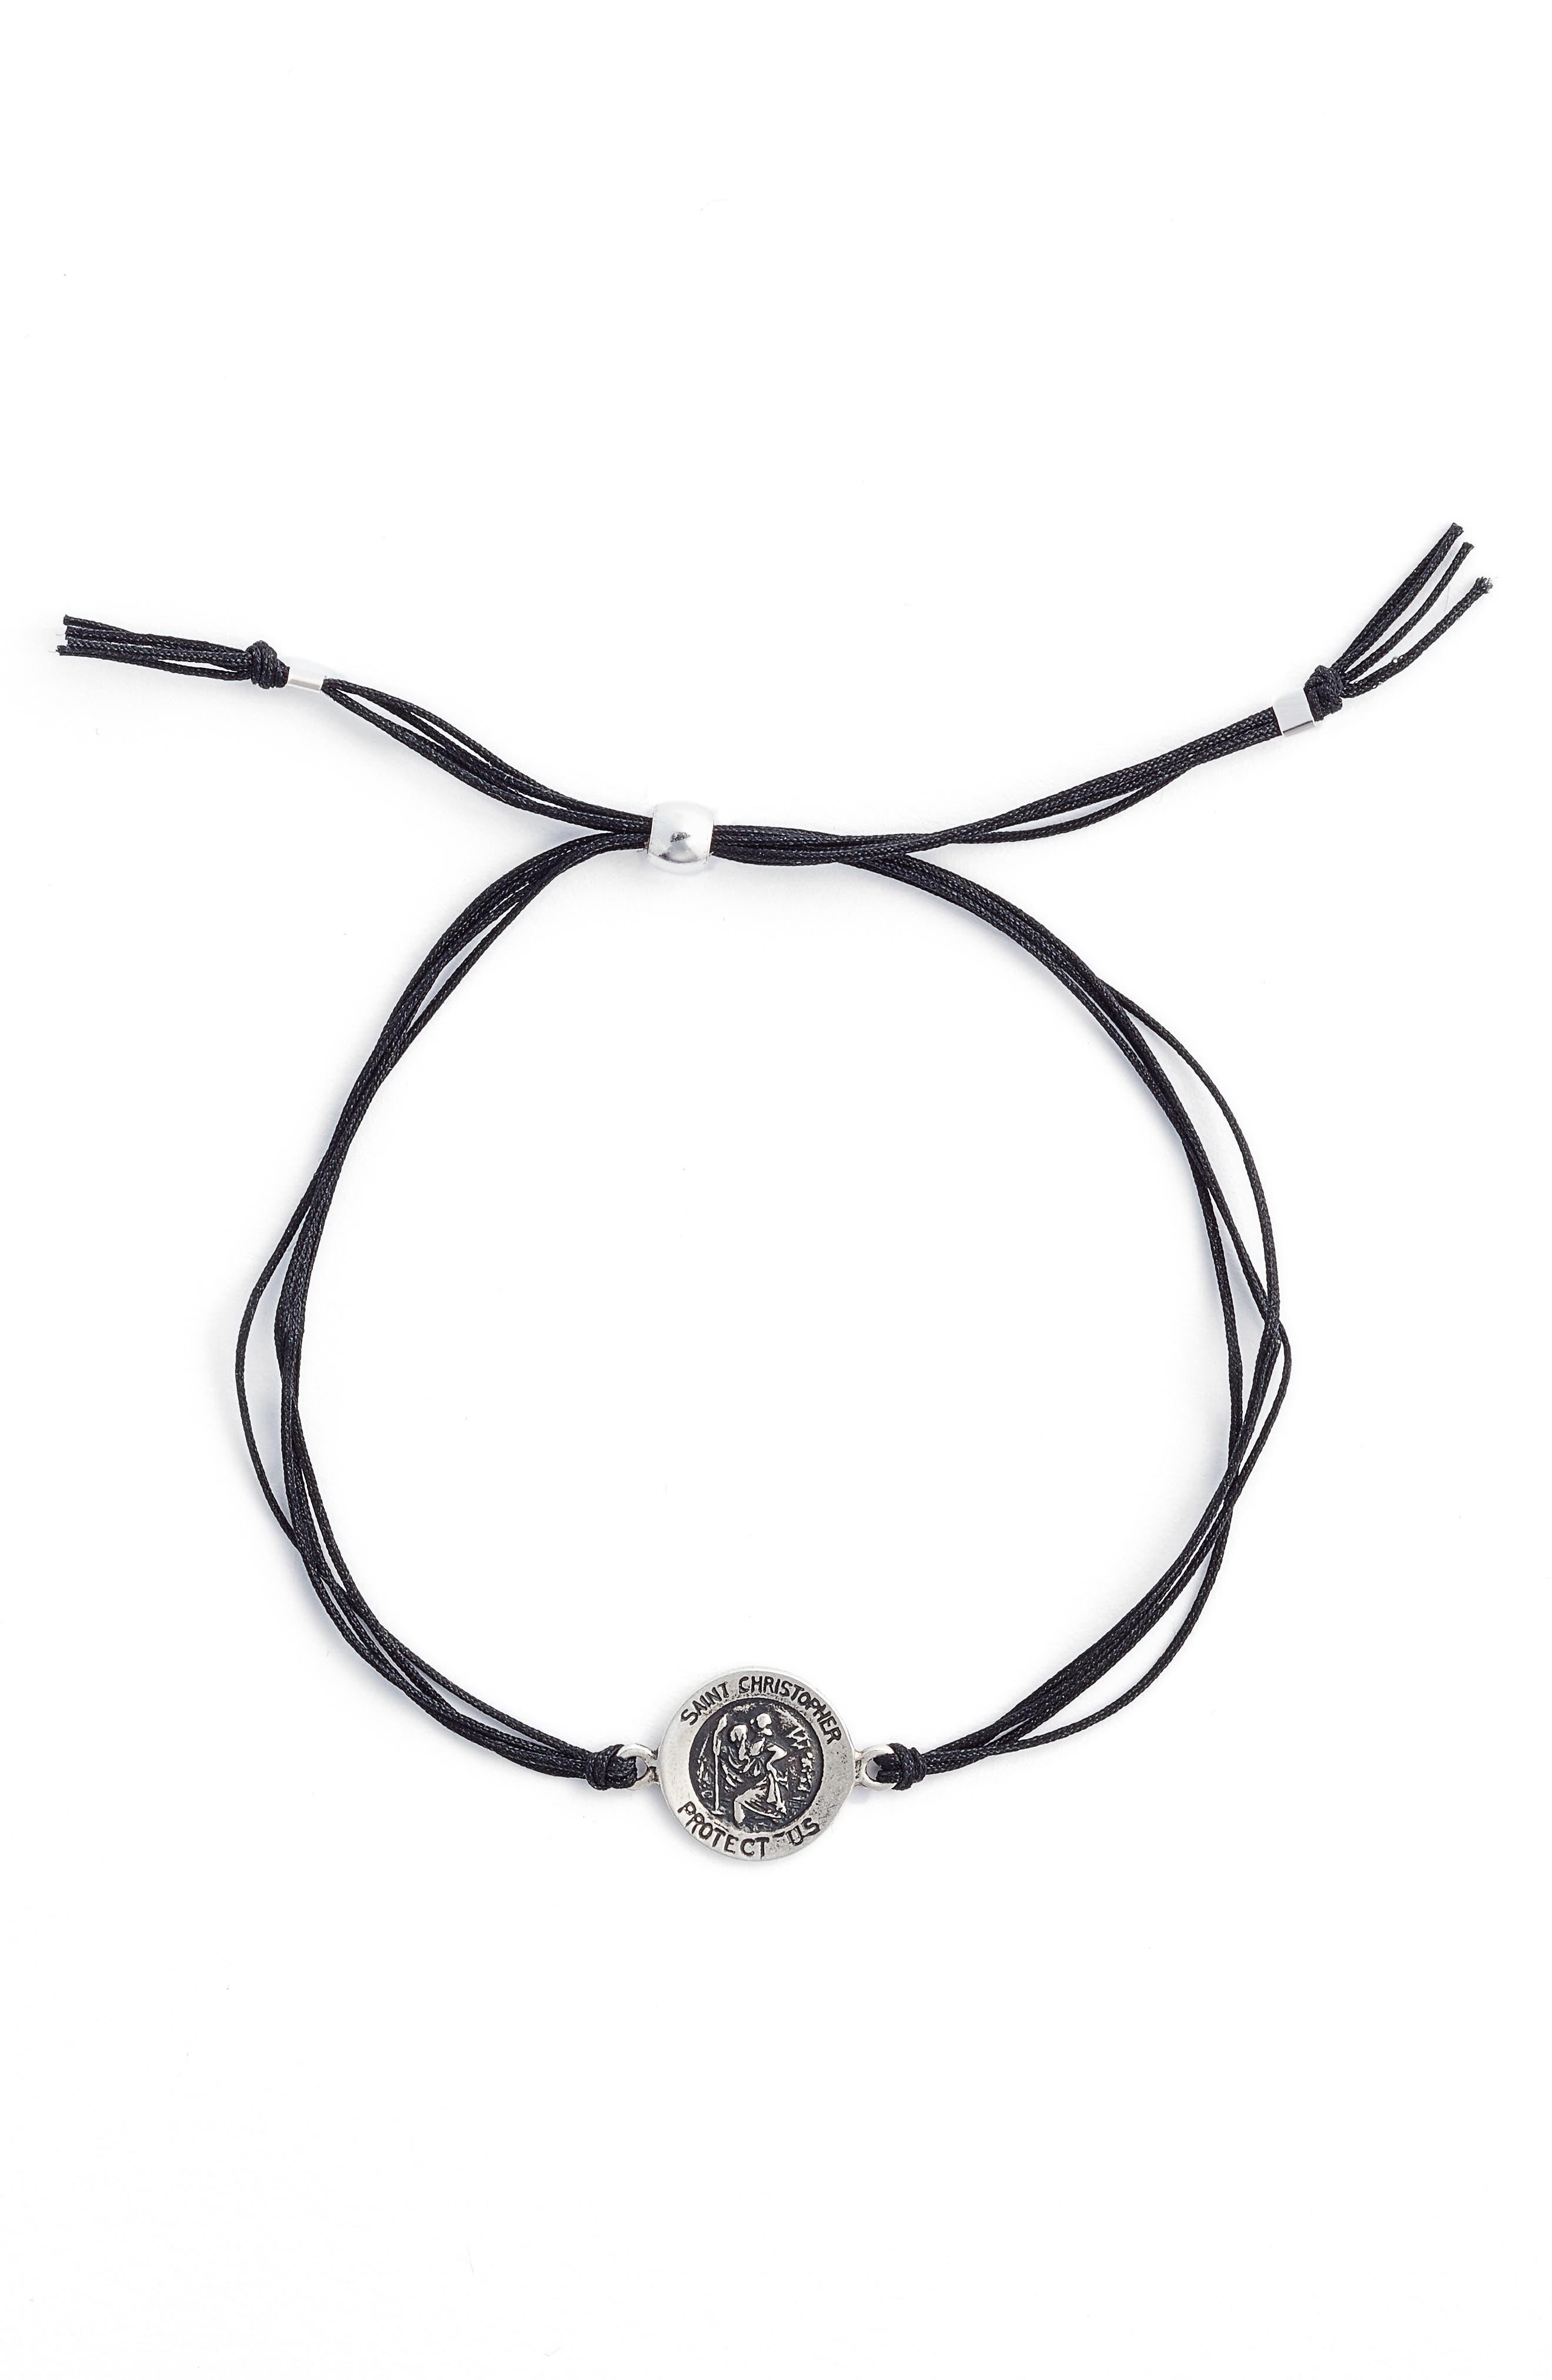 Saint Christopher Pull Bracelet,                             Alternate thumbnail 2, color,                             Black/ Silver